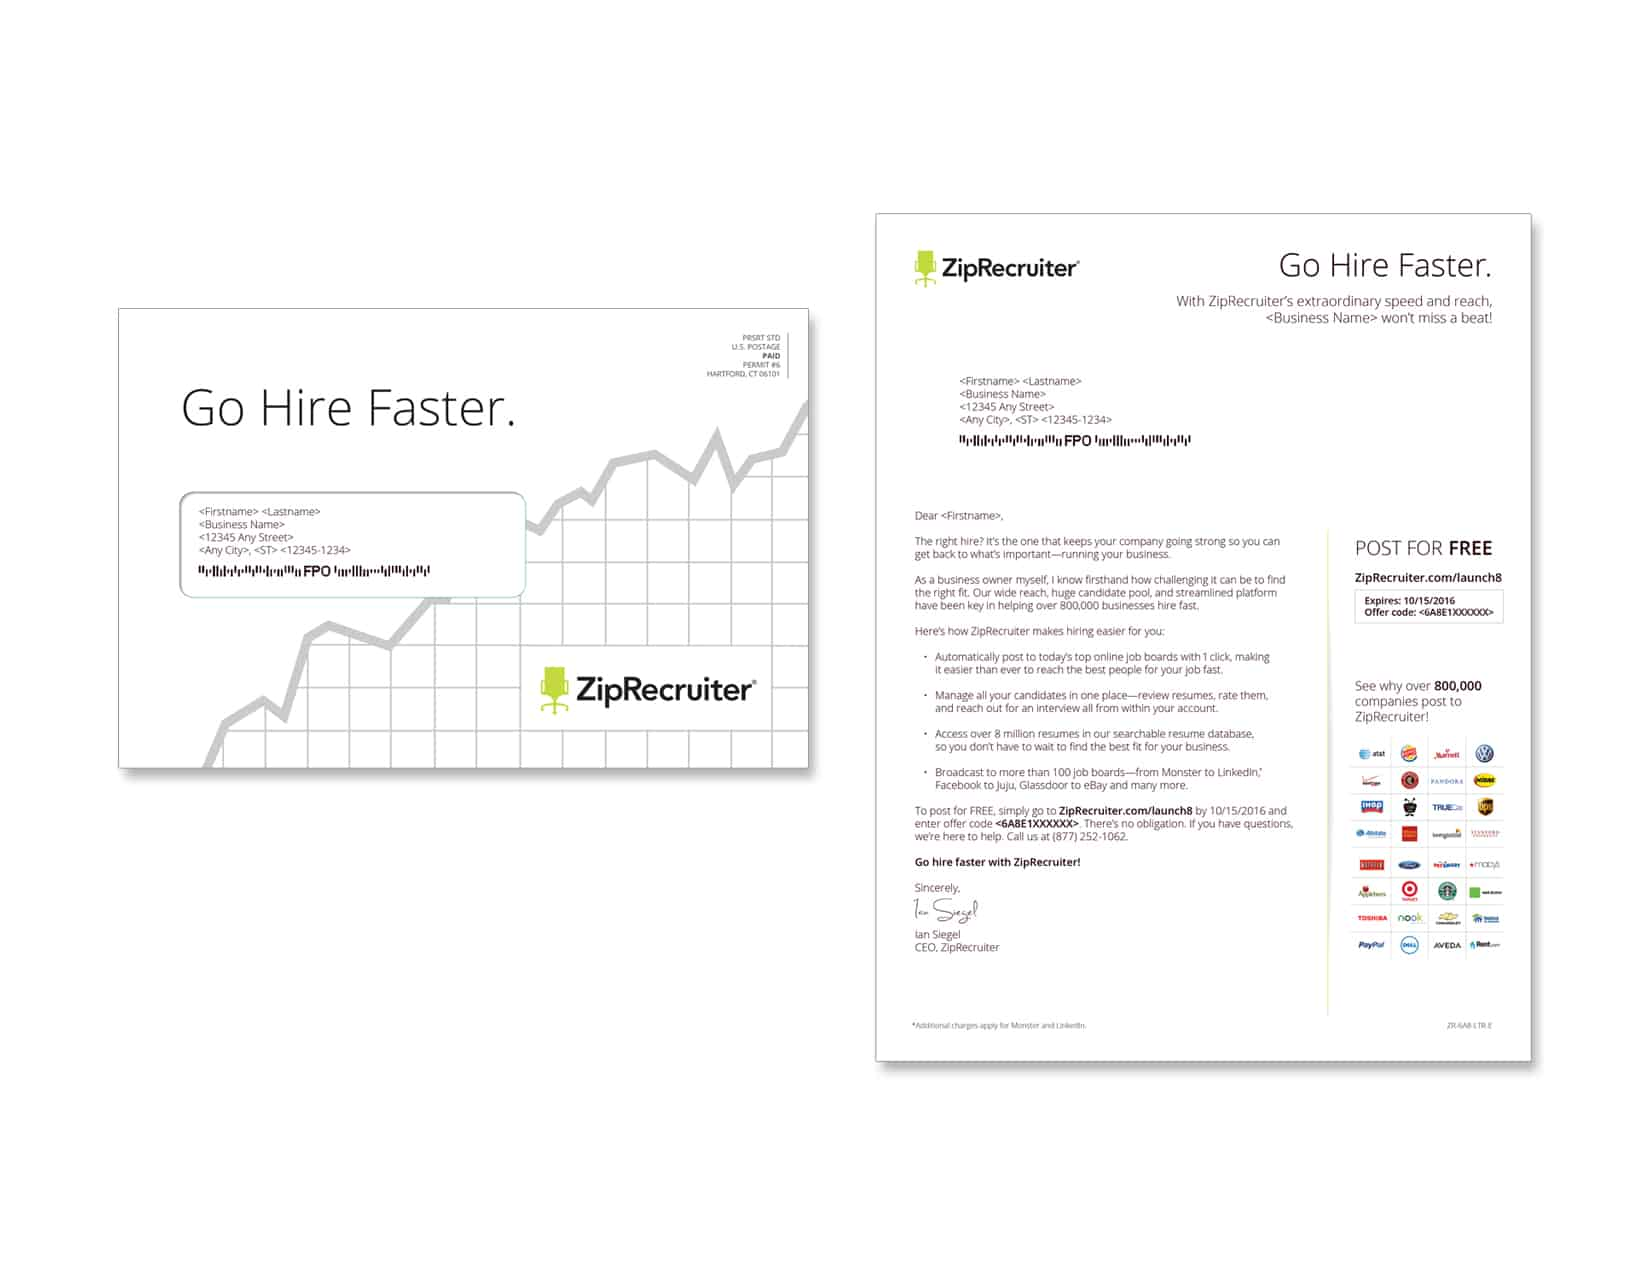 ZipRecruiter 2987-0616-3 - Direct Mail and Direct Marketing